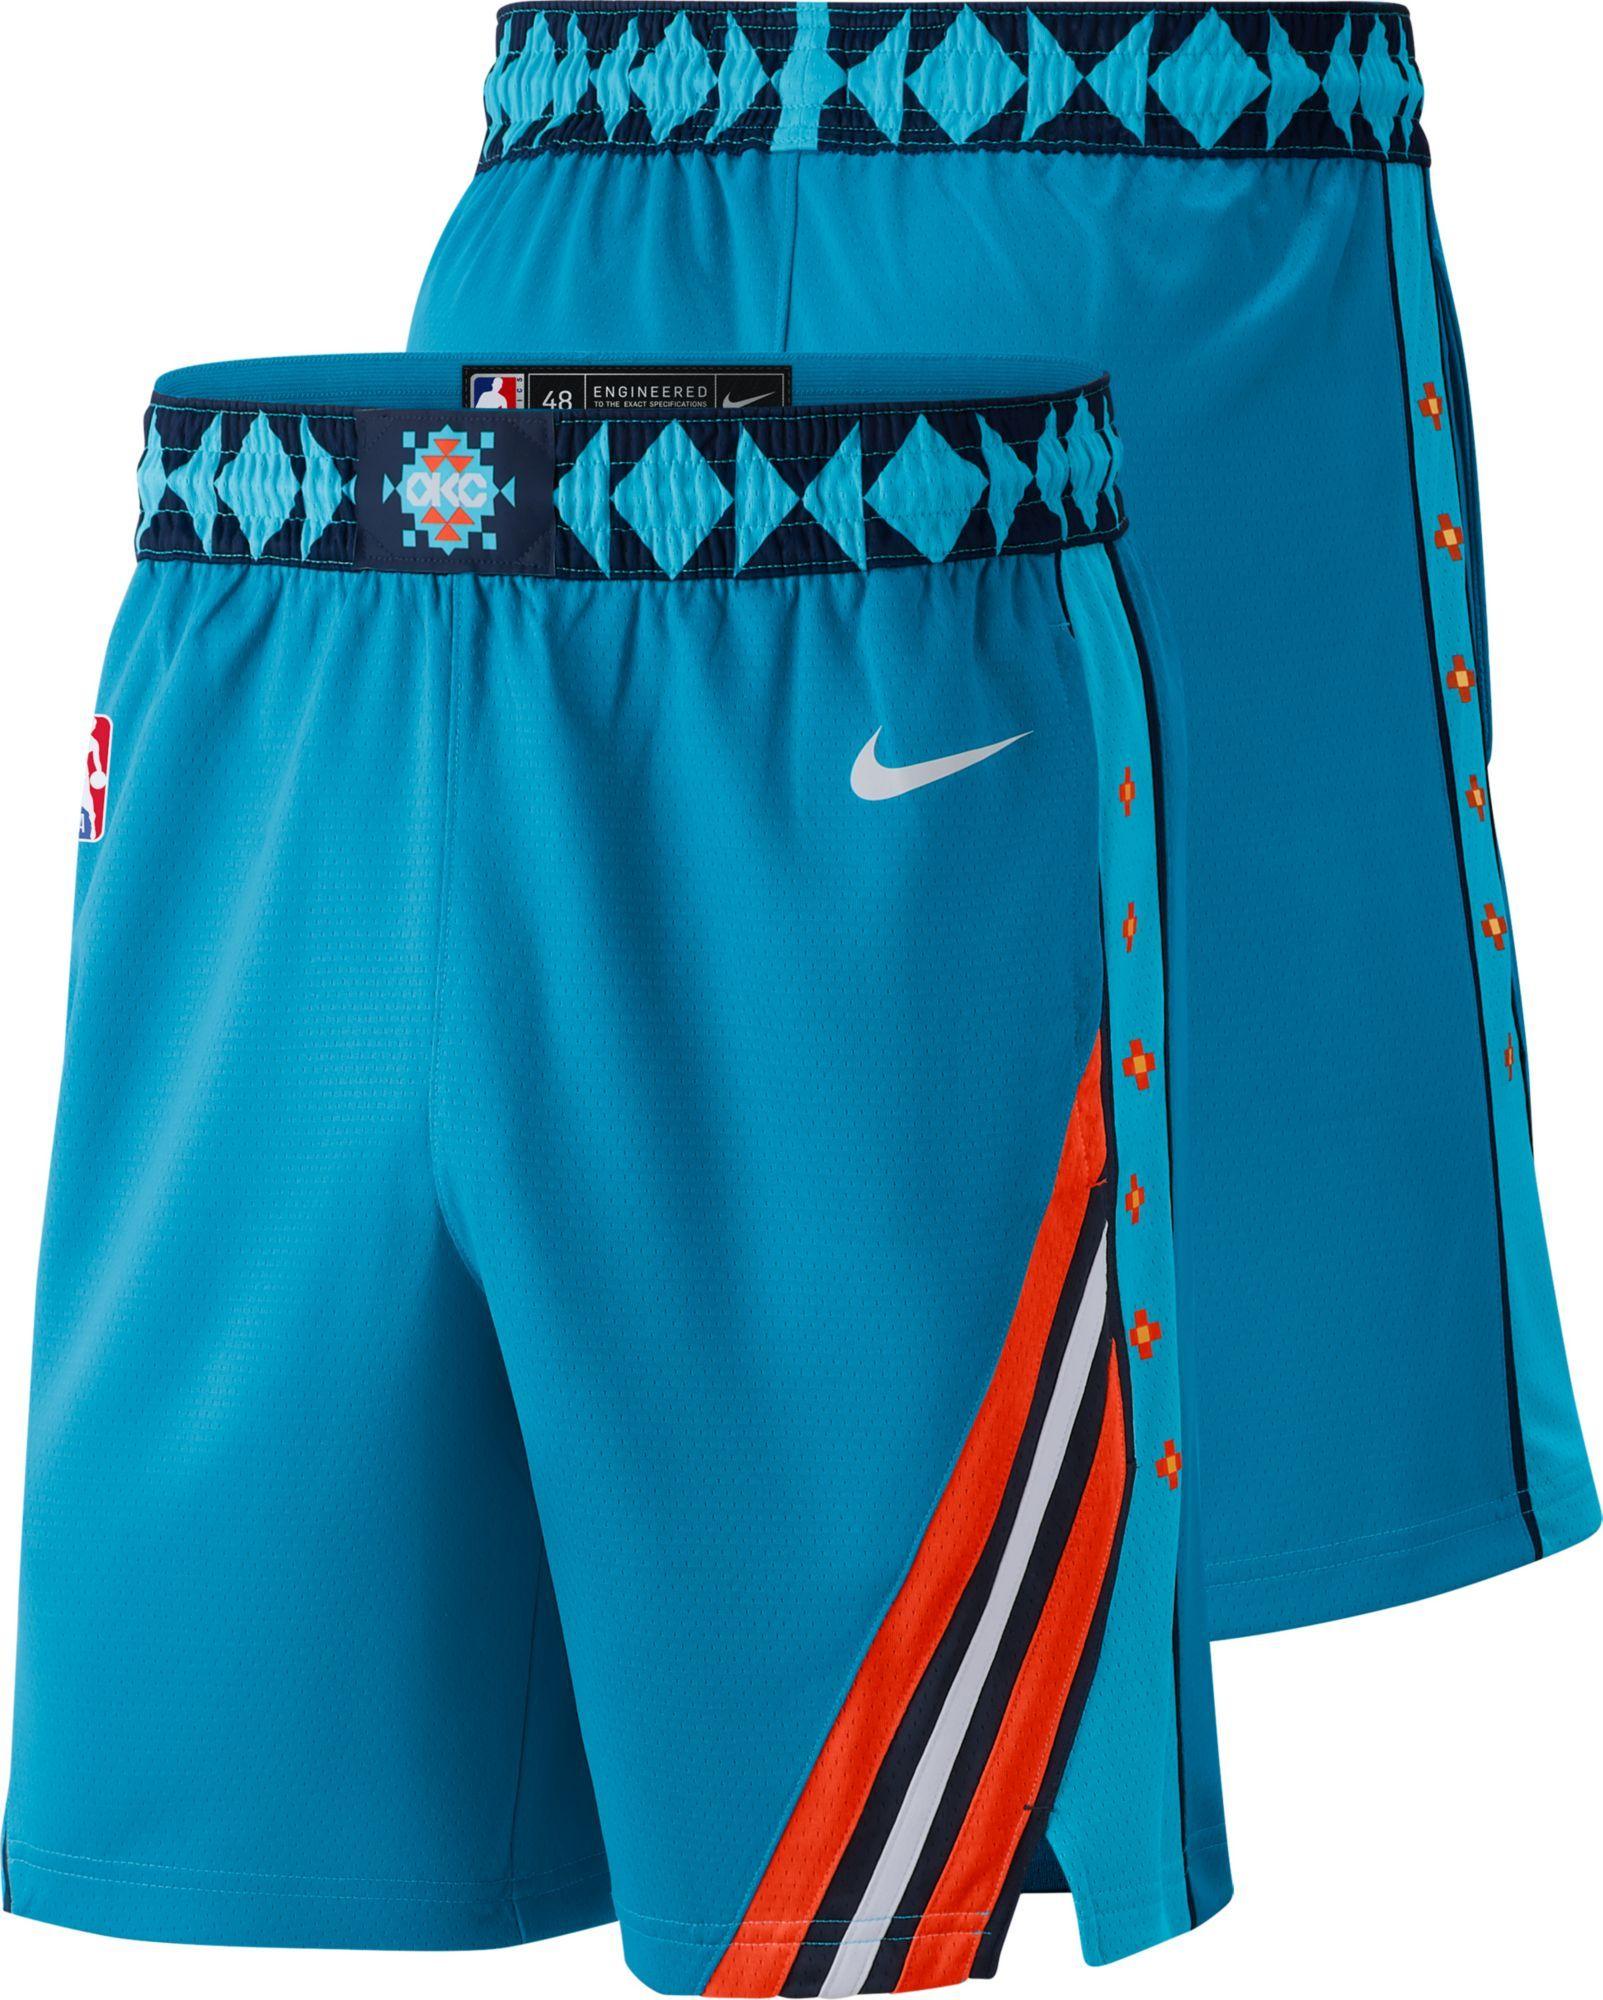 huge discount 48ceb 6b8c5 Nike Youth Oklahoma City Thunder Dri-FIT City Edition ...